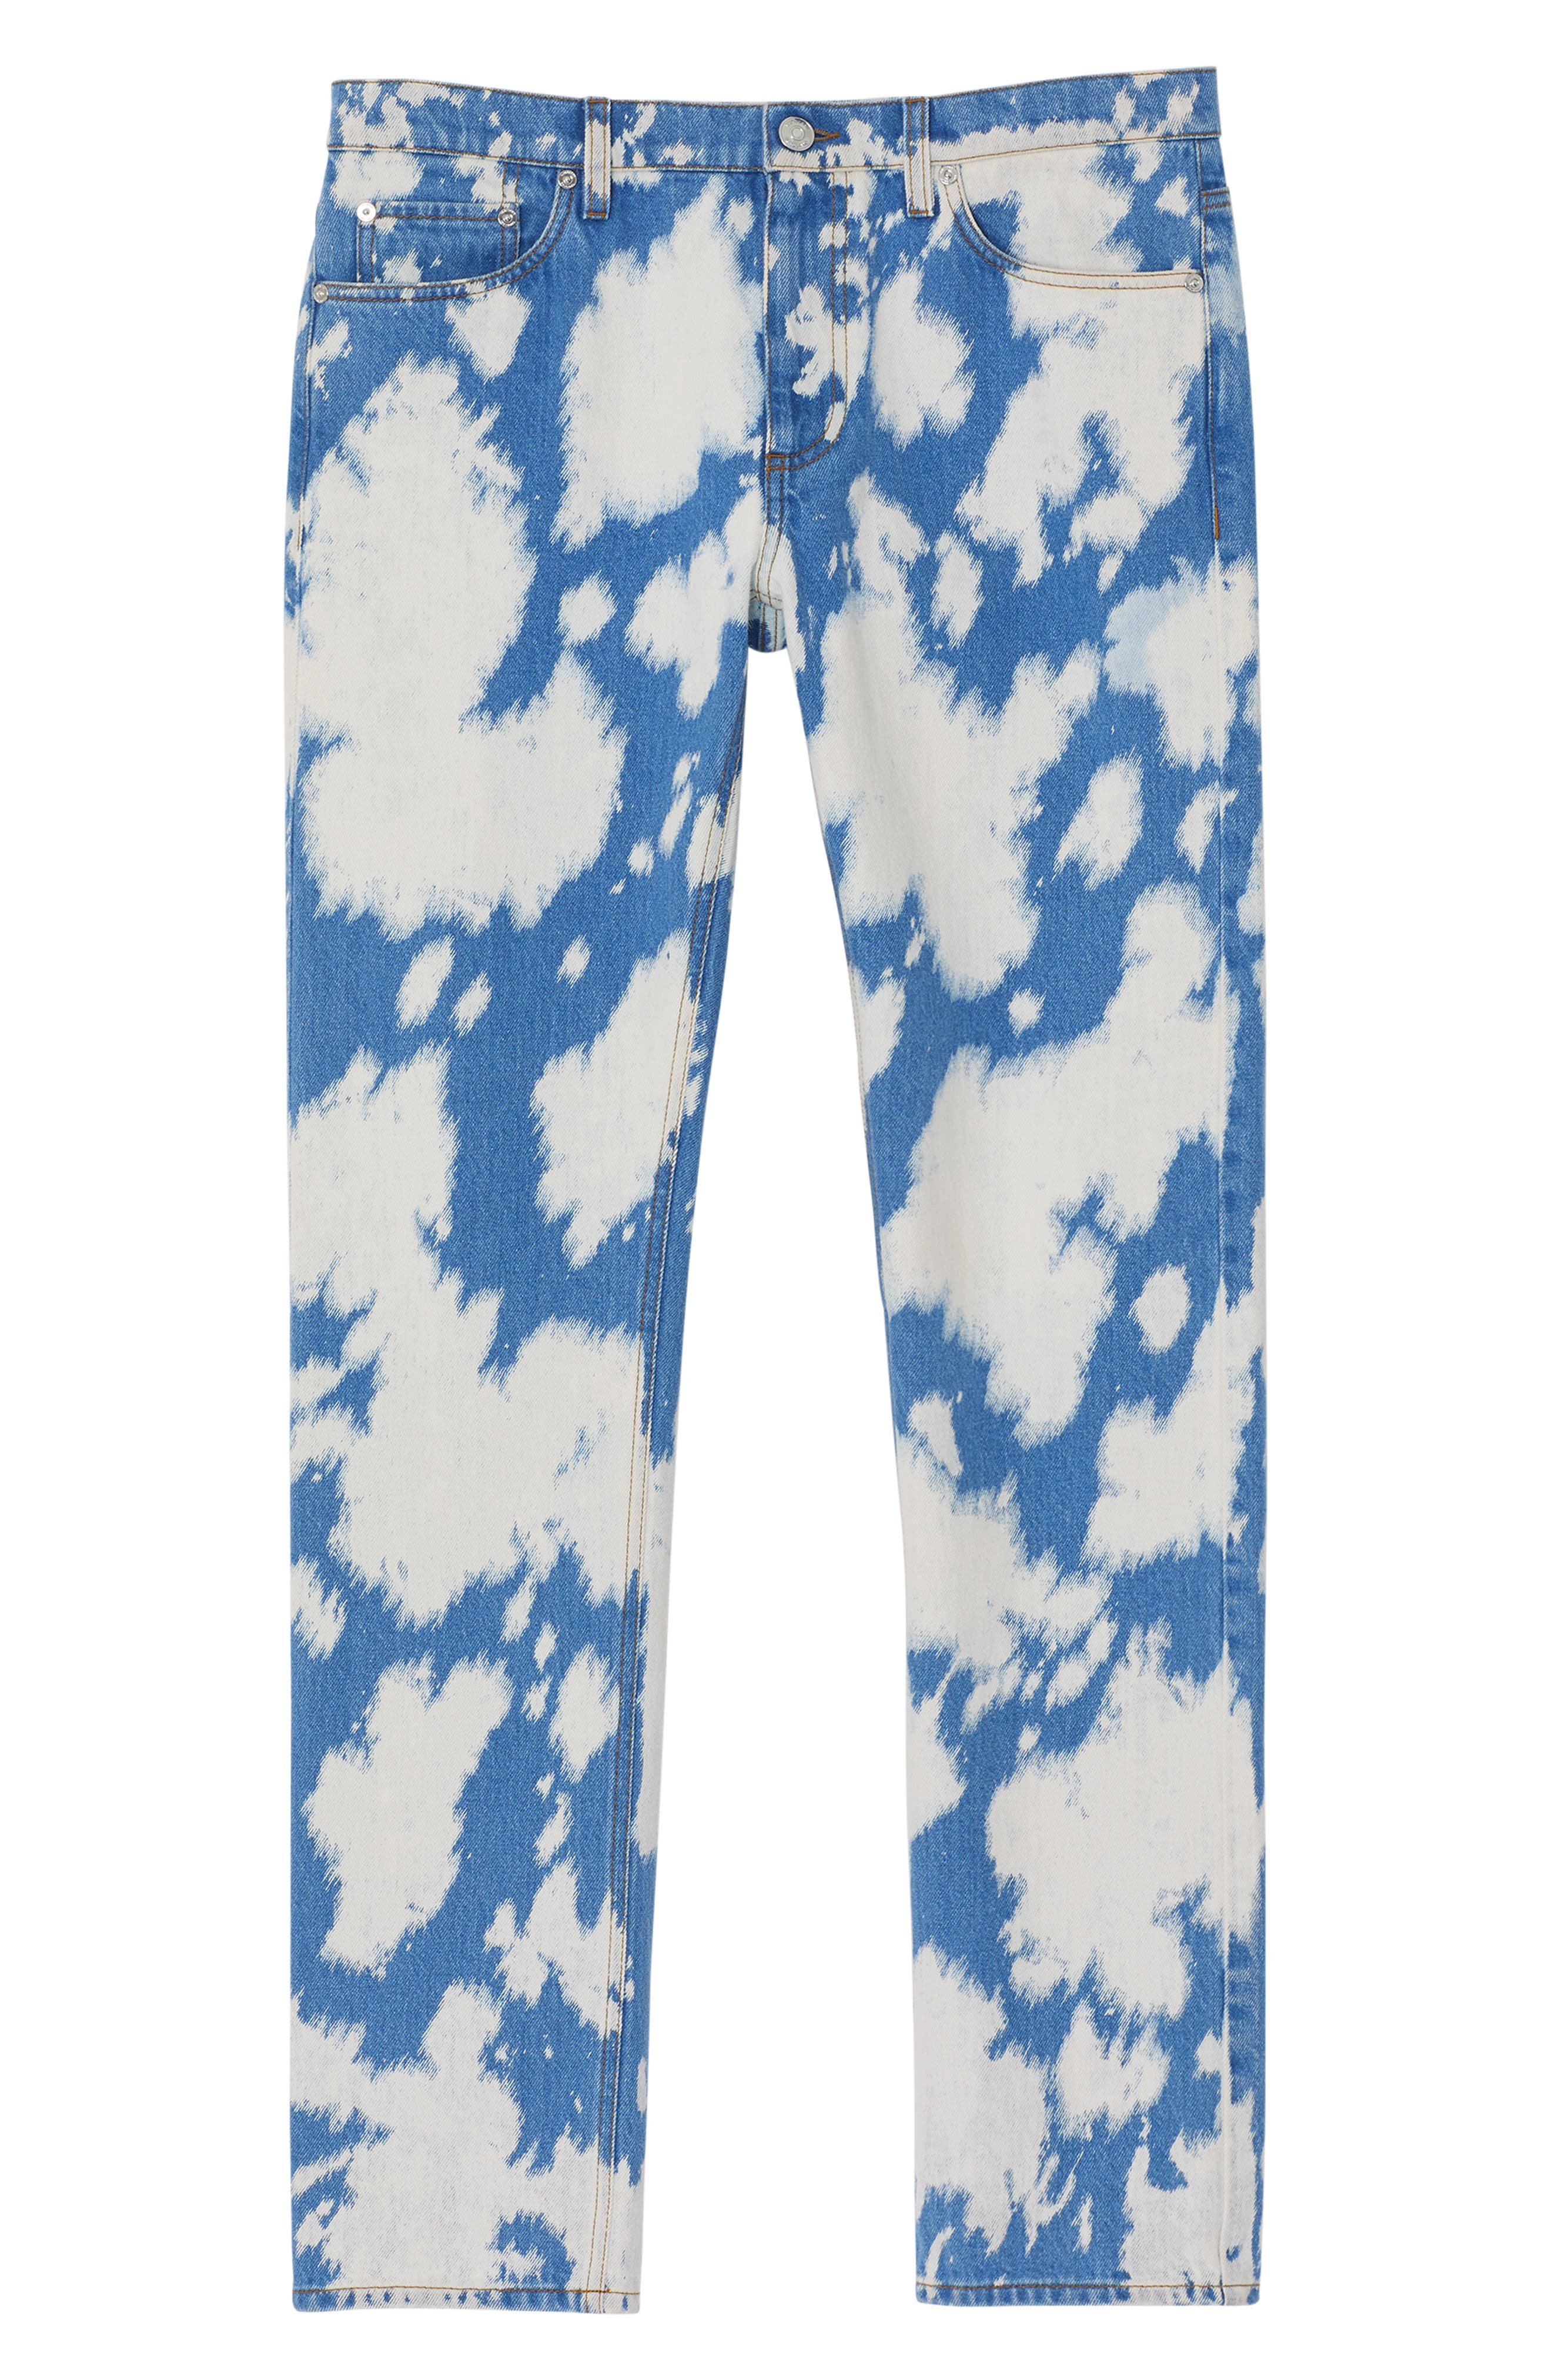 BURBERRY, Punk Bleached Straight Leg Jeans, Alternate thumbnail 5, color, LIGHT INDIGO